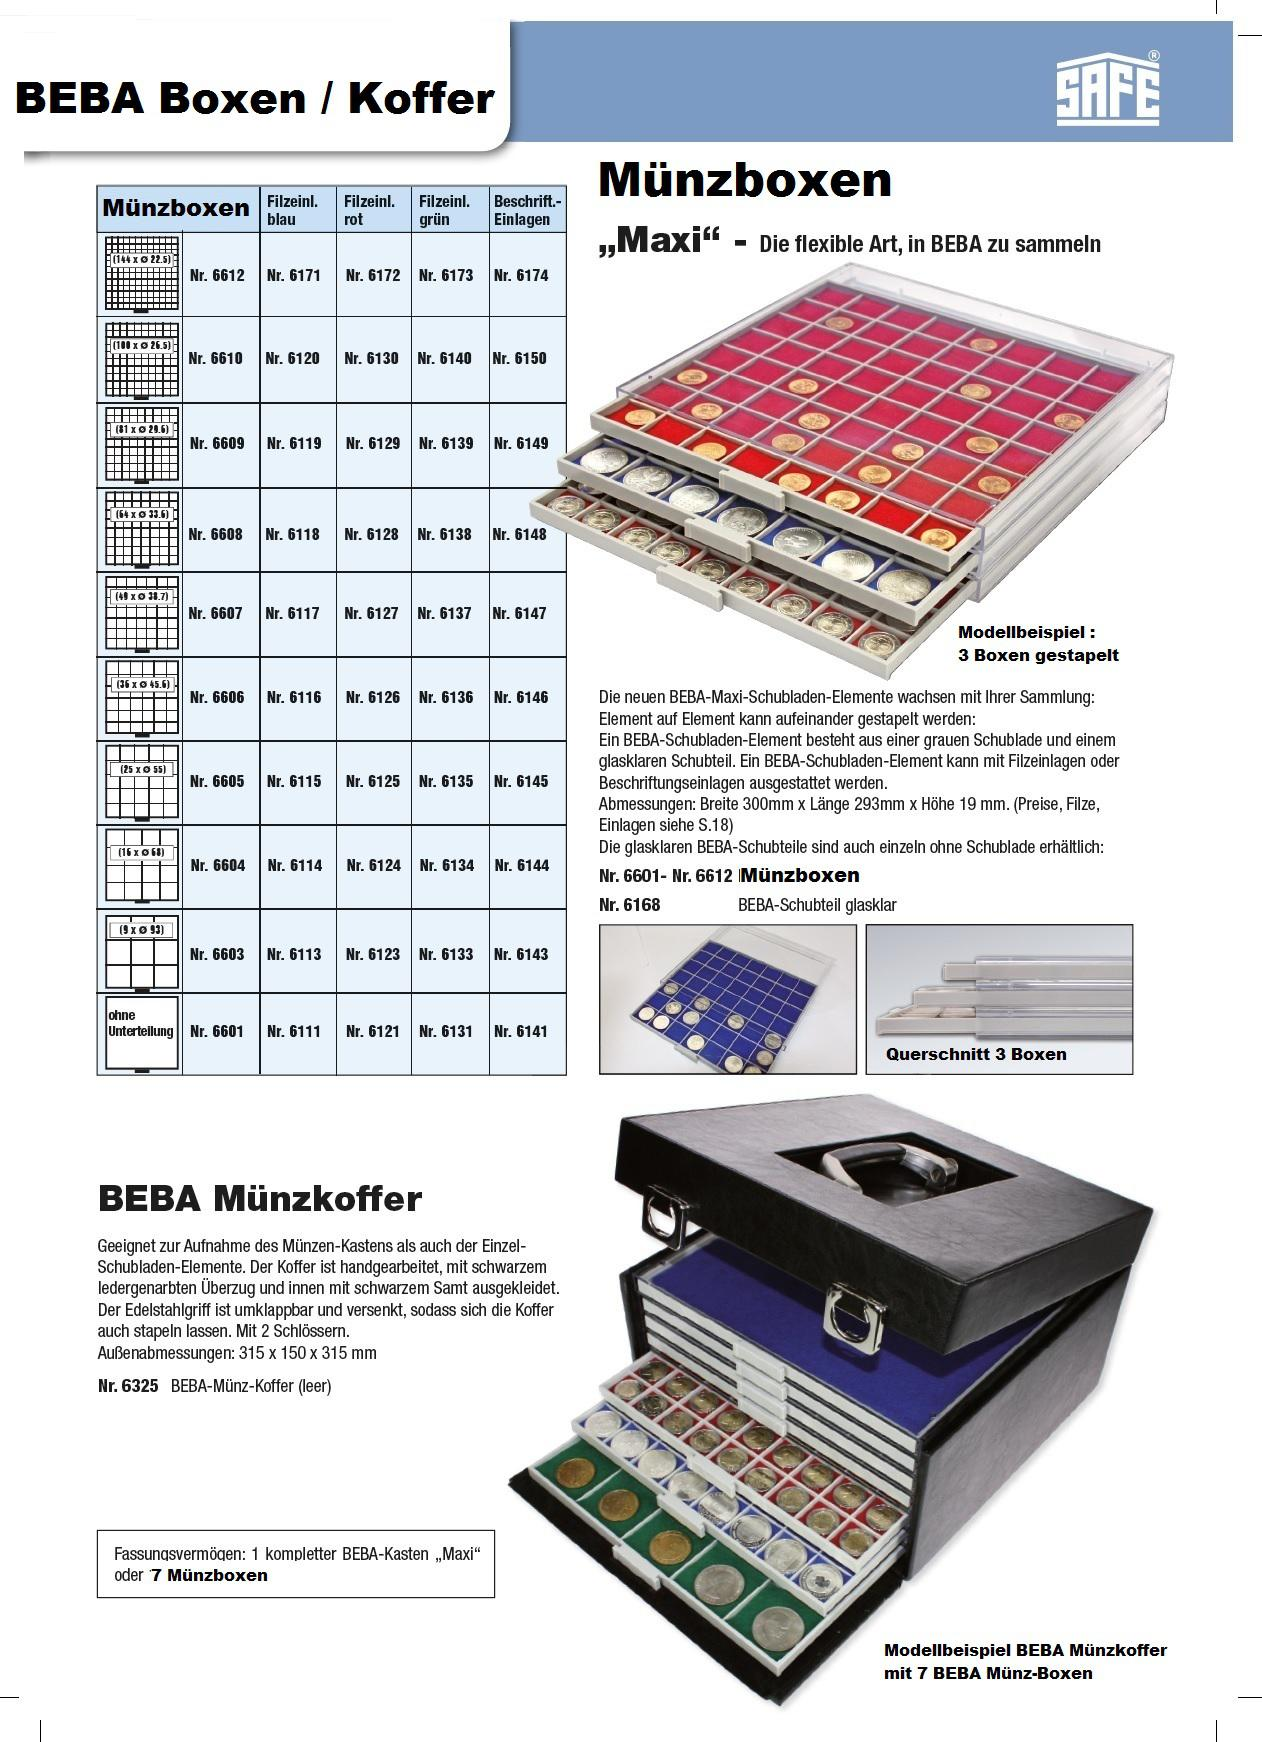 Berühmt Schaltplan Schublade Fotos - Elektrische Schaltplan-Ideen ...